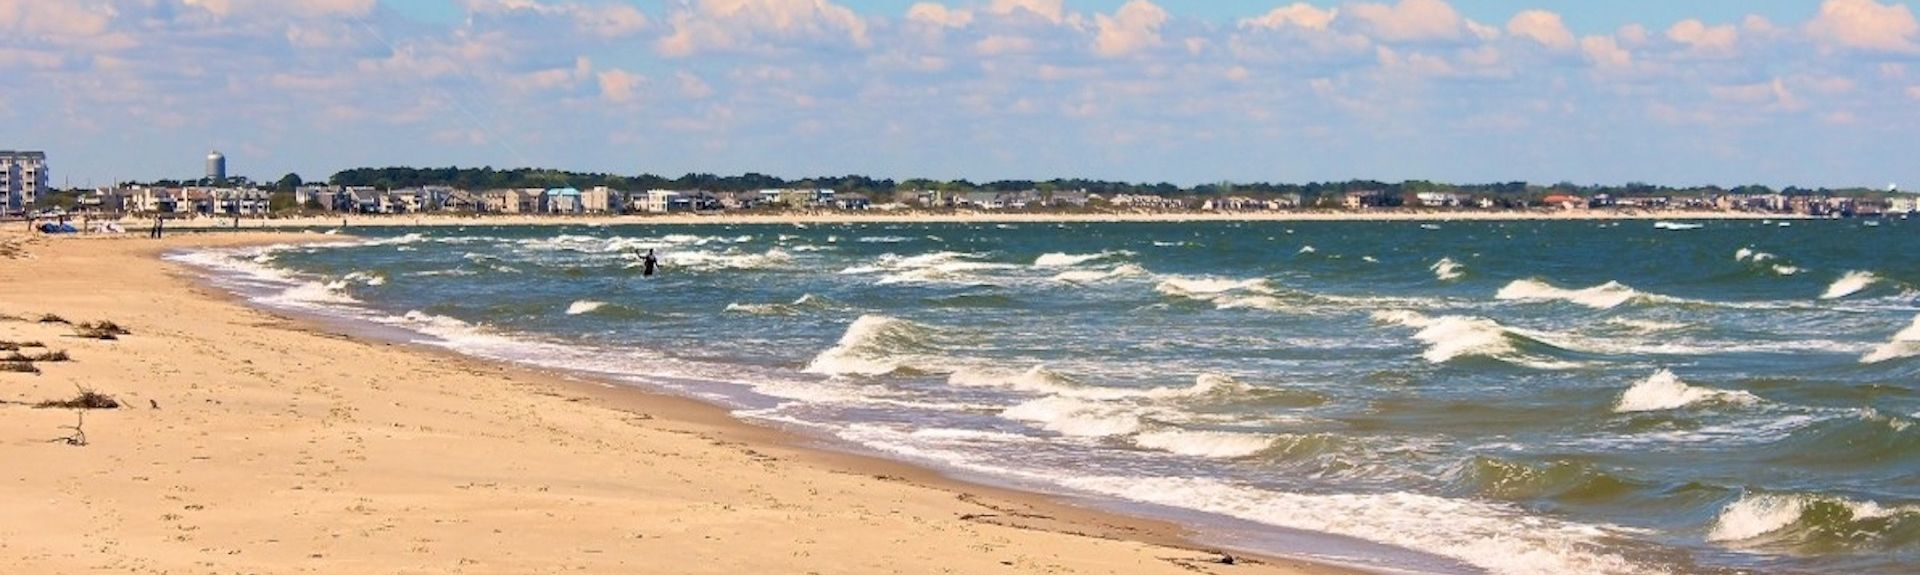 Northwest, Virginia Beach, VA, USA